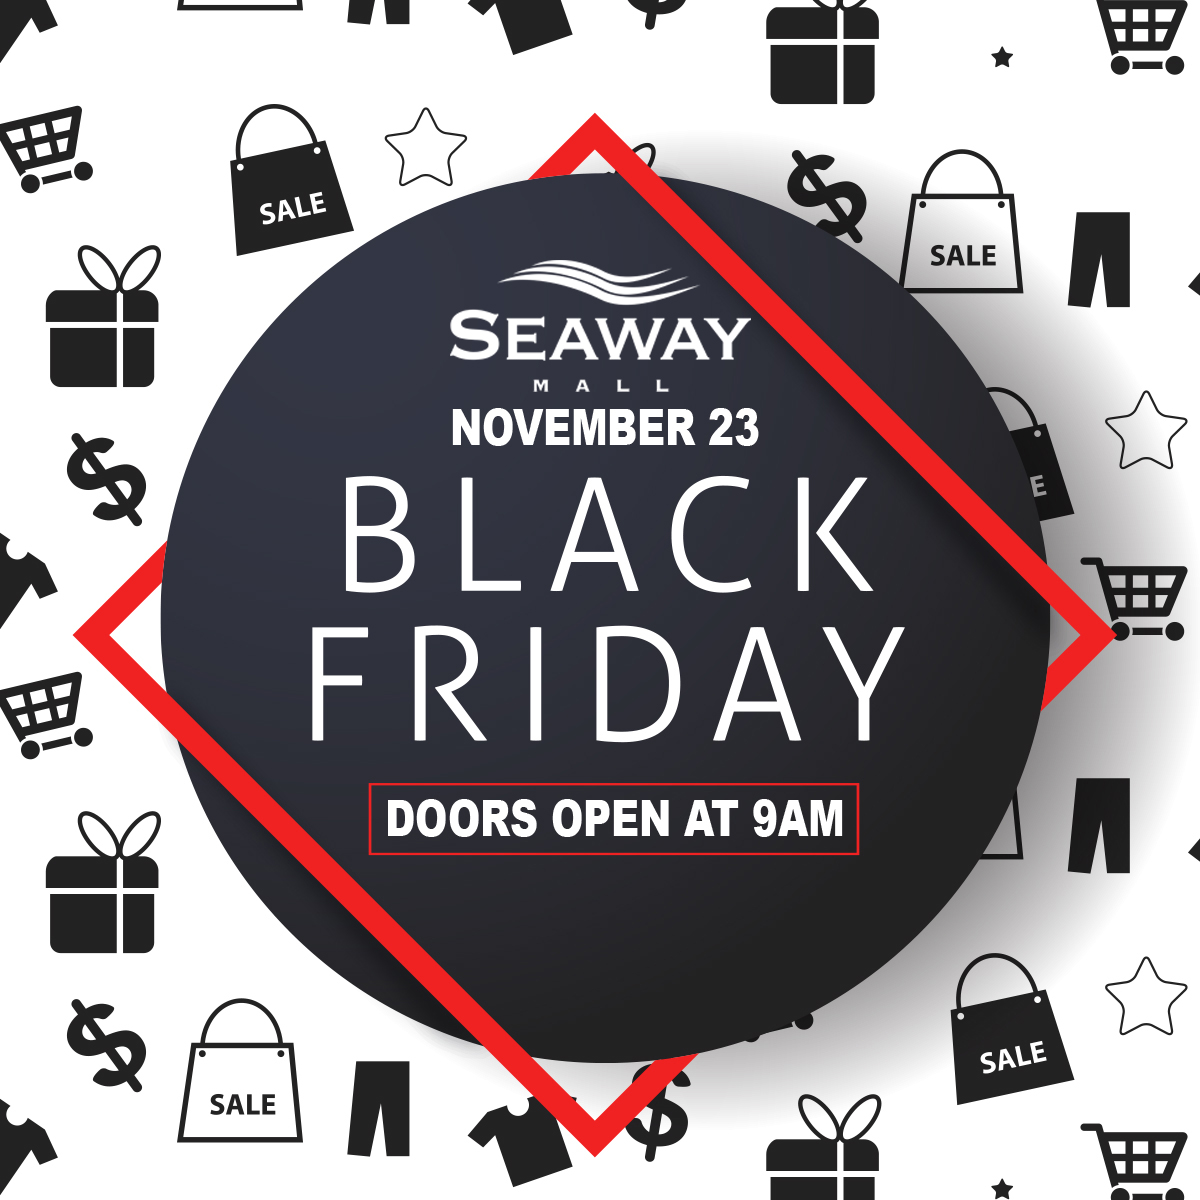 Seaway Mall Black Friday